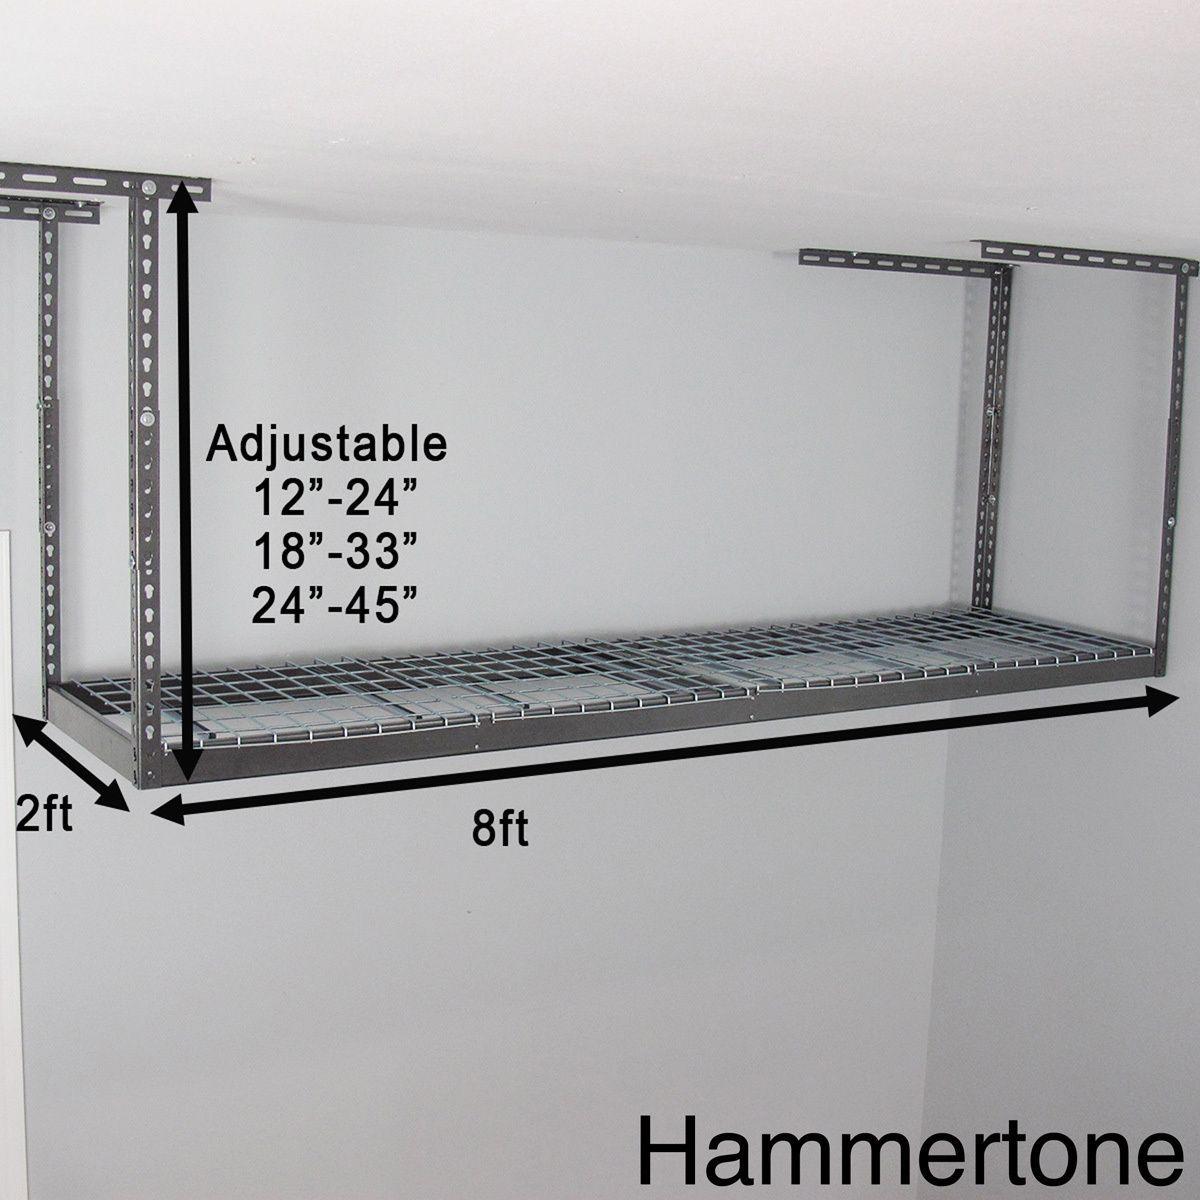 MonsterRax 2' X 8' Overhead Garage Storage Rack (Ceiling